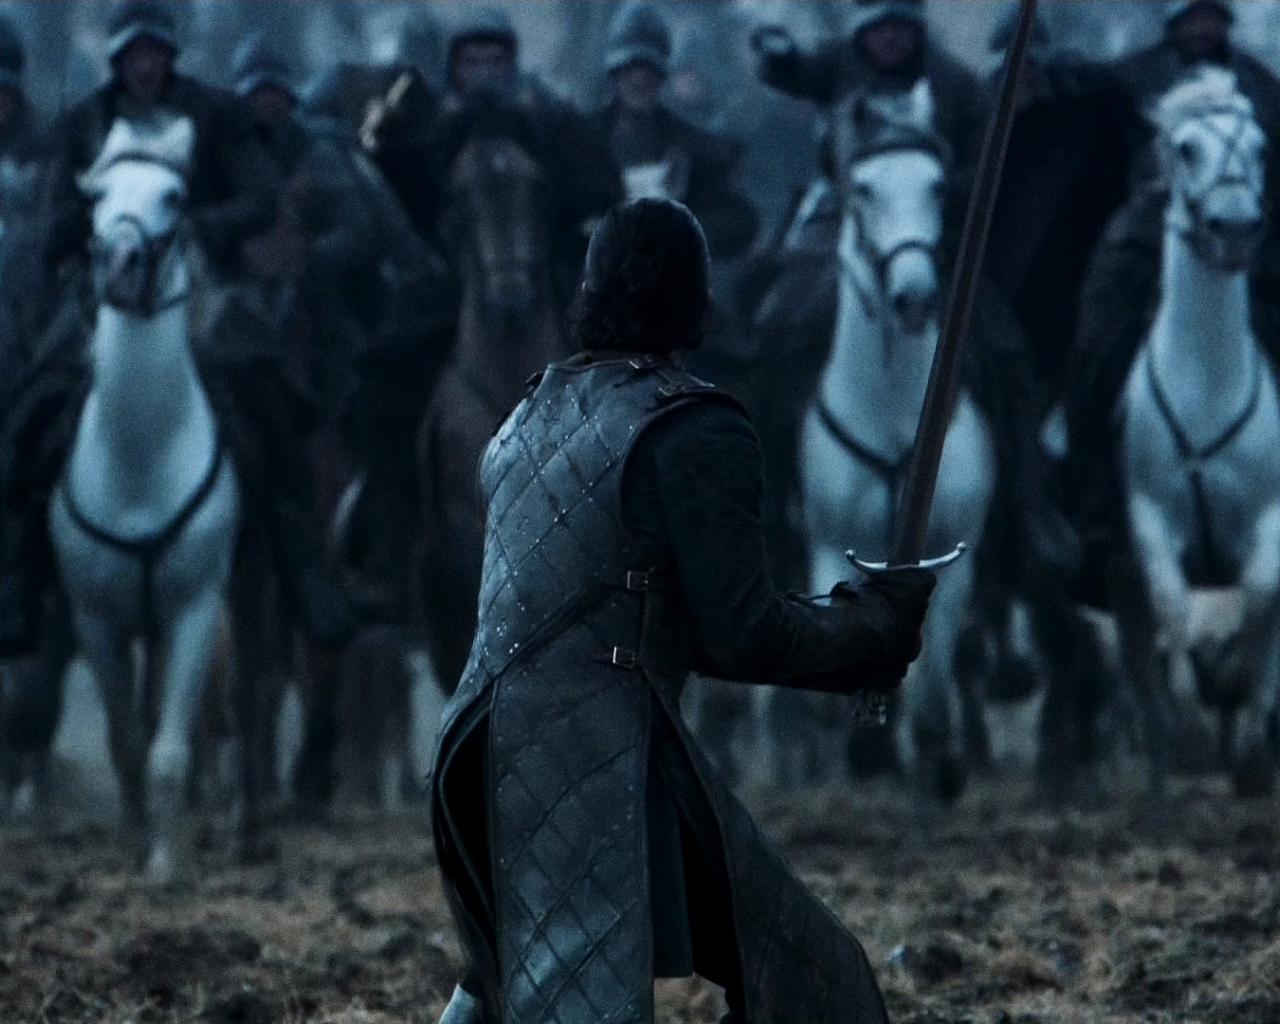 Free Download Jon Snow Wallpaper Battle Of The Bastards Meme